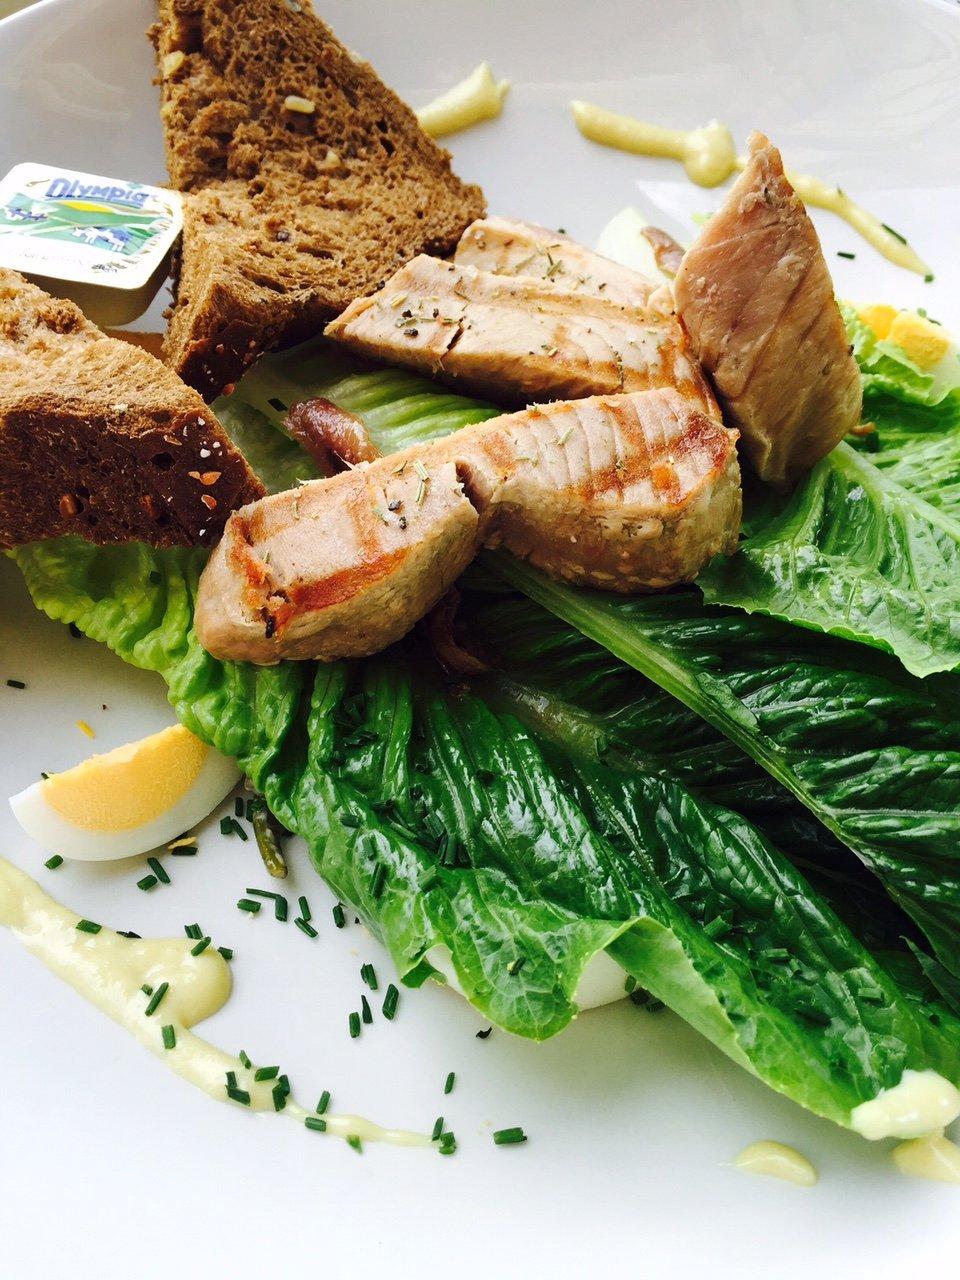 Nicoise salade restaurant De waag leiden foodblog Foodinista